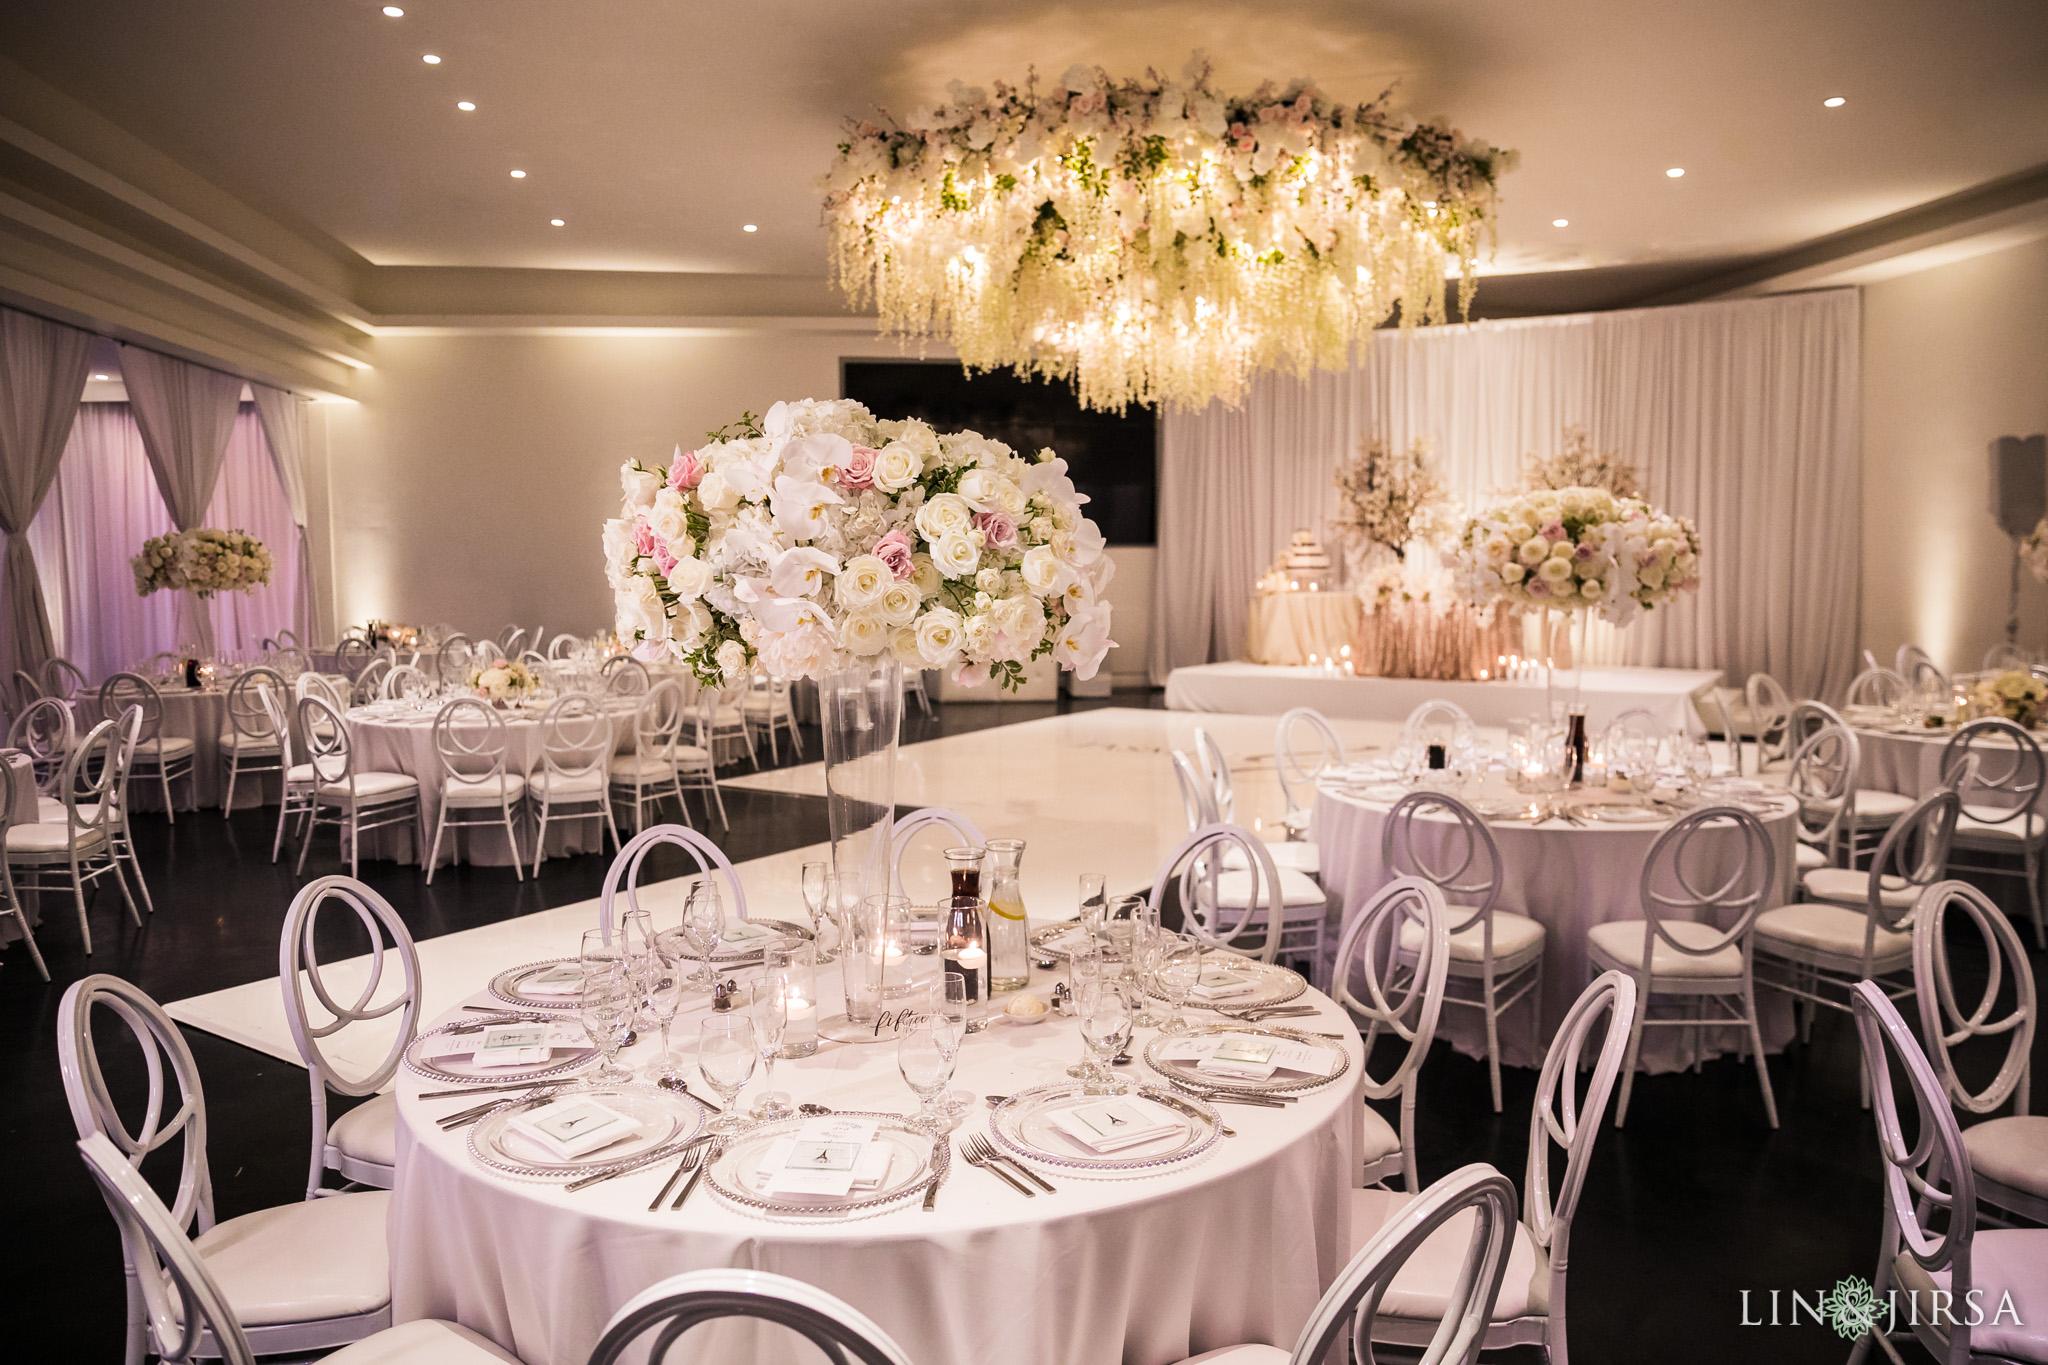 13 venue by three petals huntington beach wedding photography